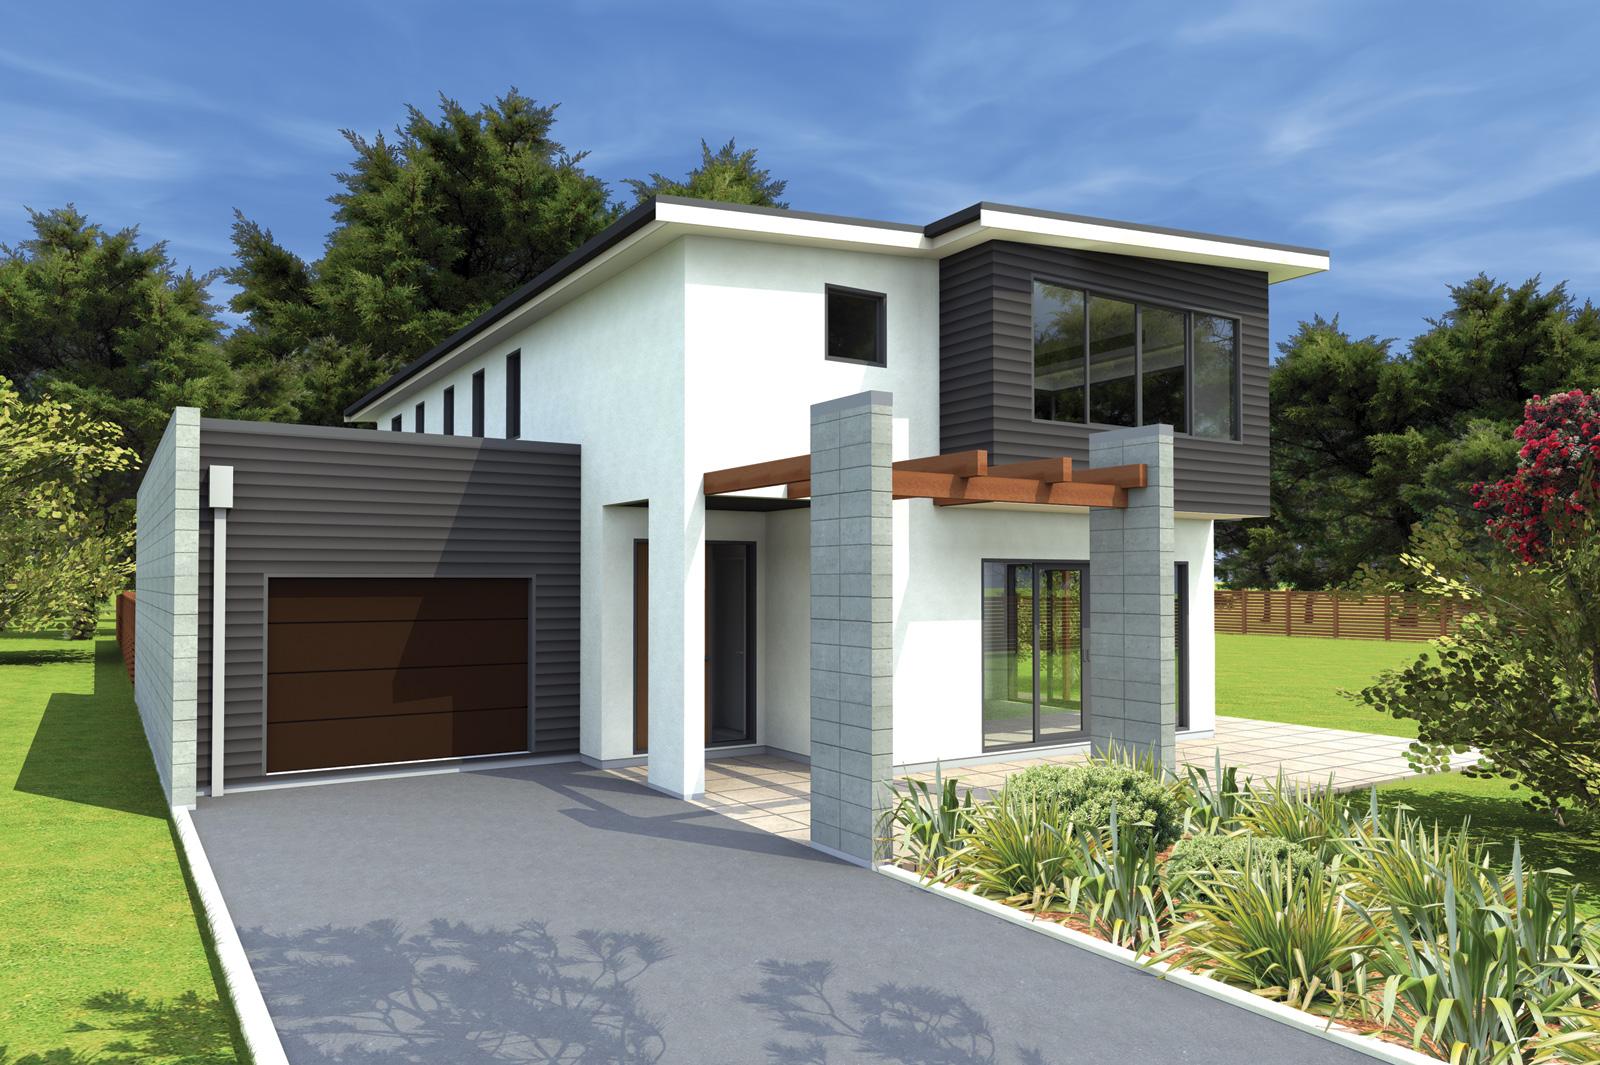 New Modern Home Designs peenmediacom